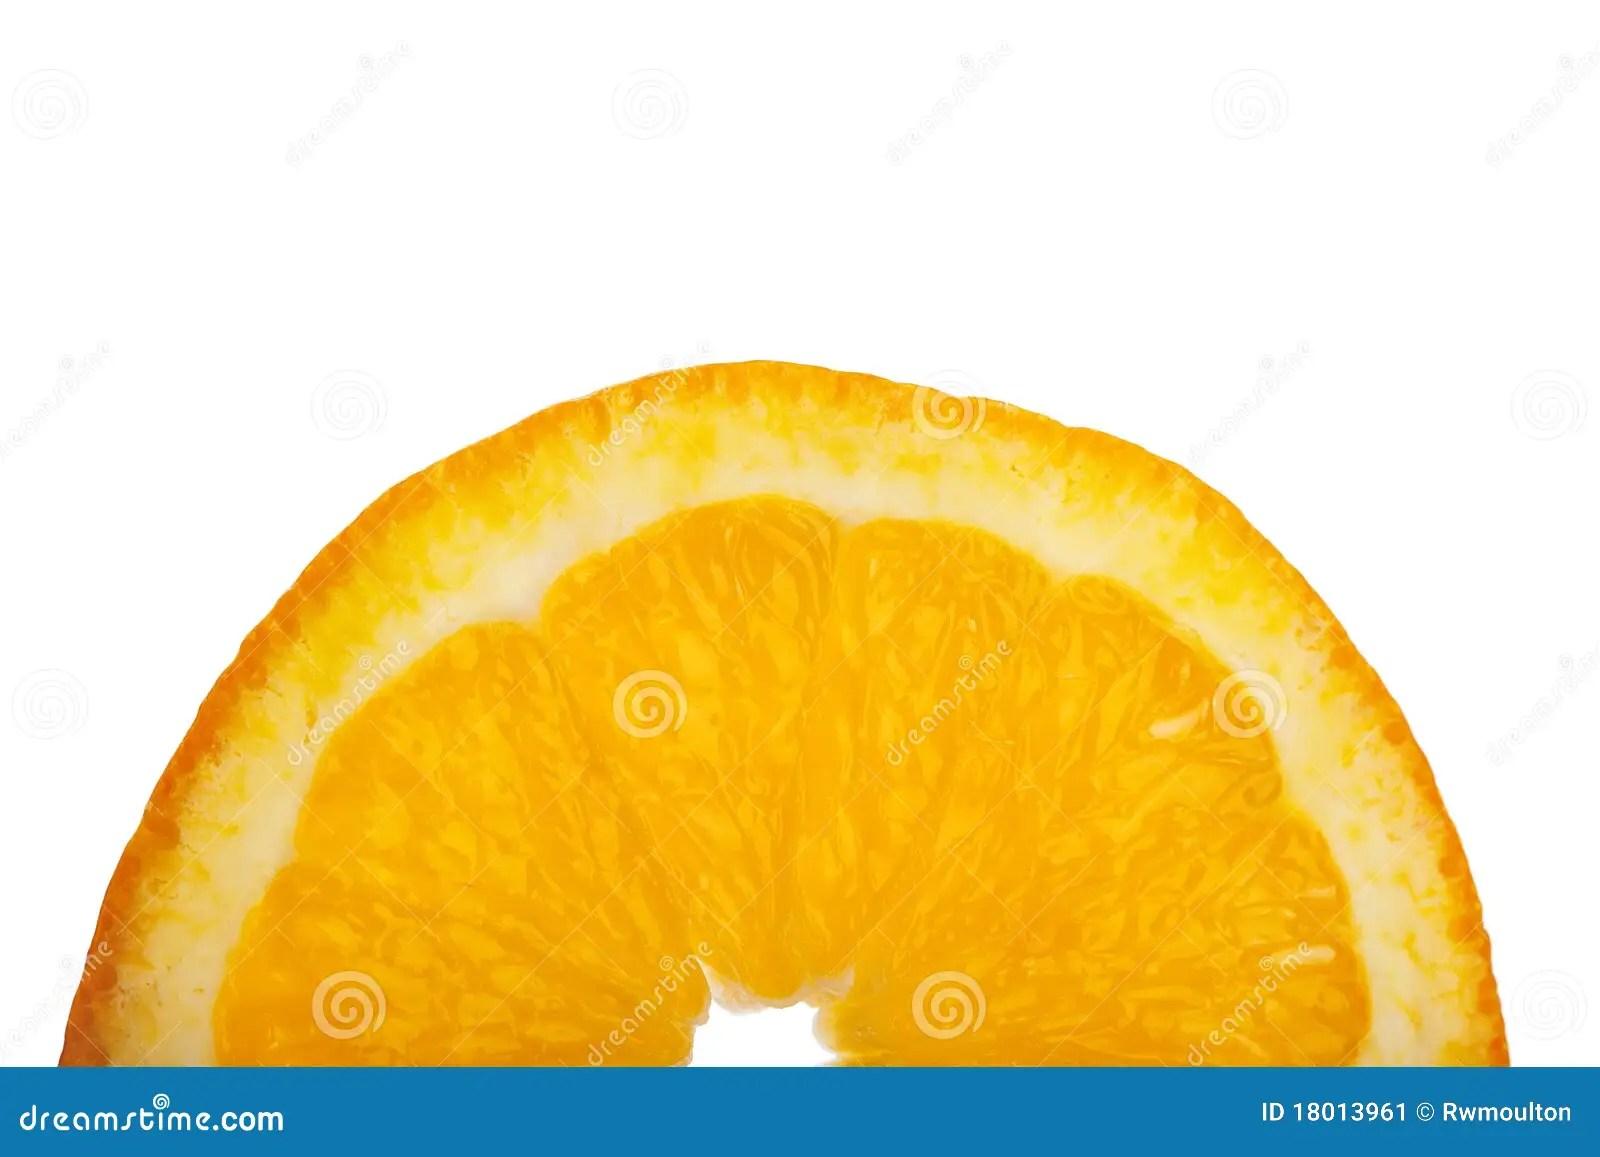 Half Orange And Orange Slice Royalty-Free Stock Photo